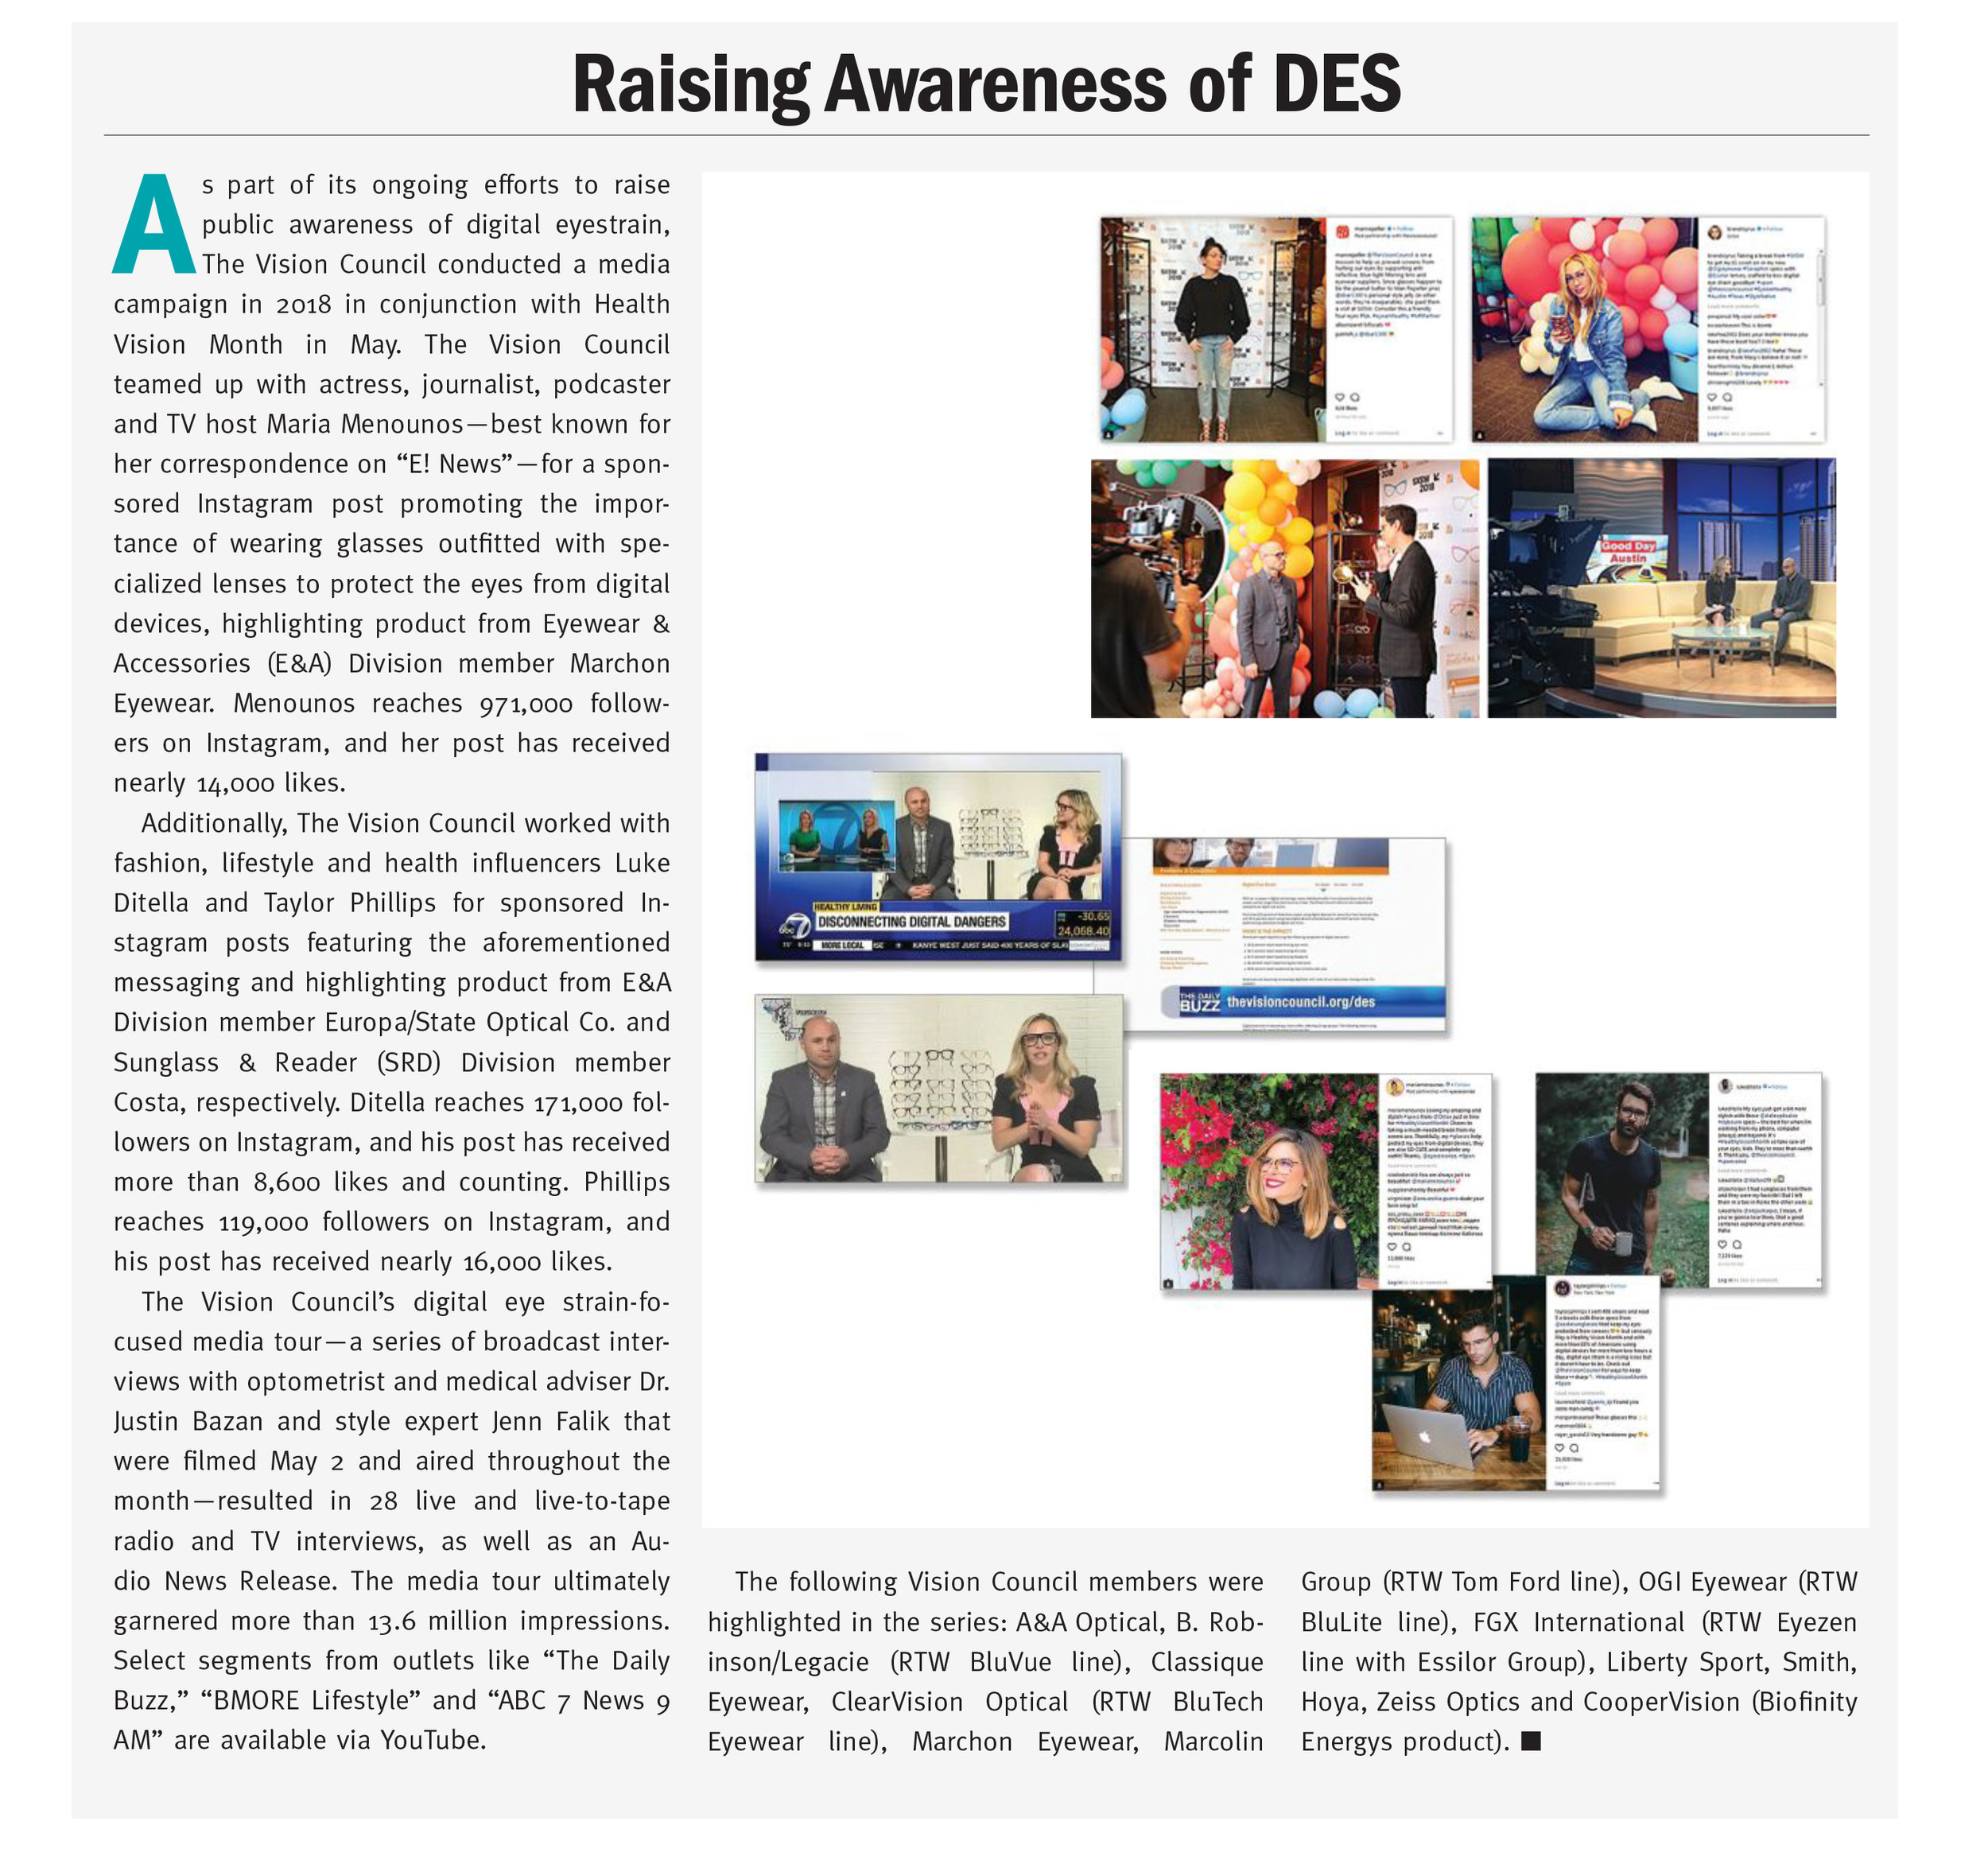 01-2019 VM issue_Digital Eyestrain_article (dragged).jpg